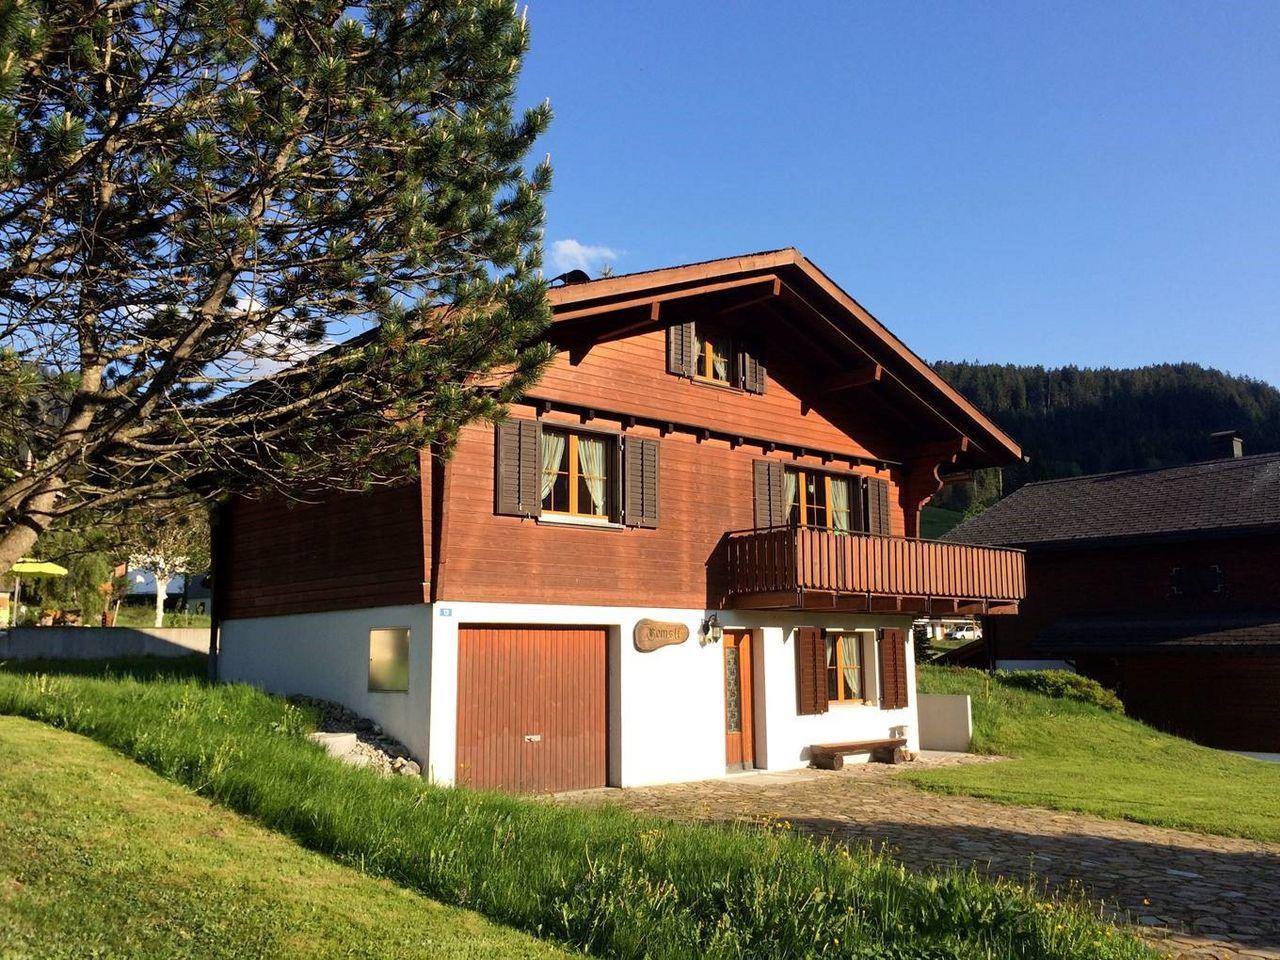 Chalet Gemsli - Brunni-Alpthal